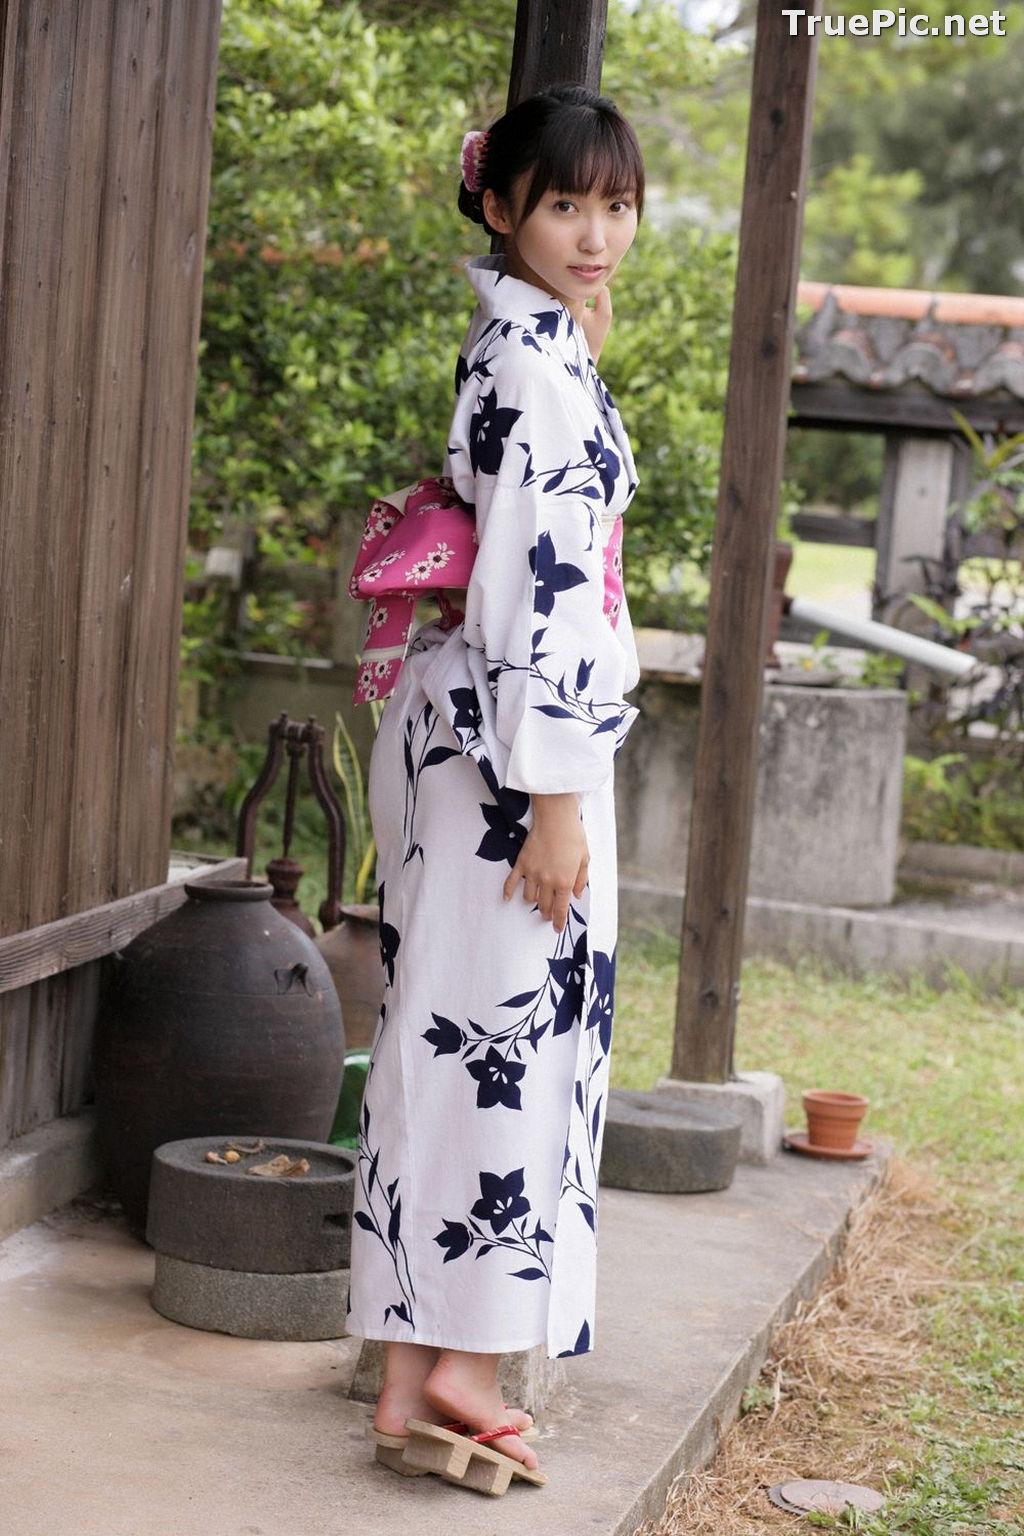 Image [YS Web] Vol.527 - Japanese Gravure Idol and Singer - Risa Yoshiki - TruePic.net - Picture-5